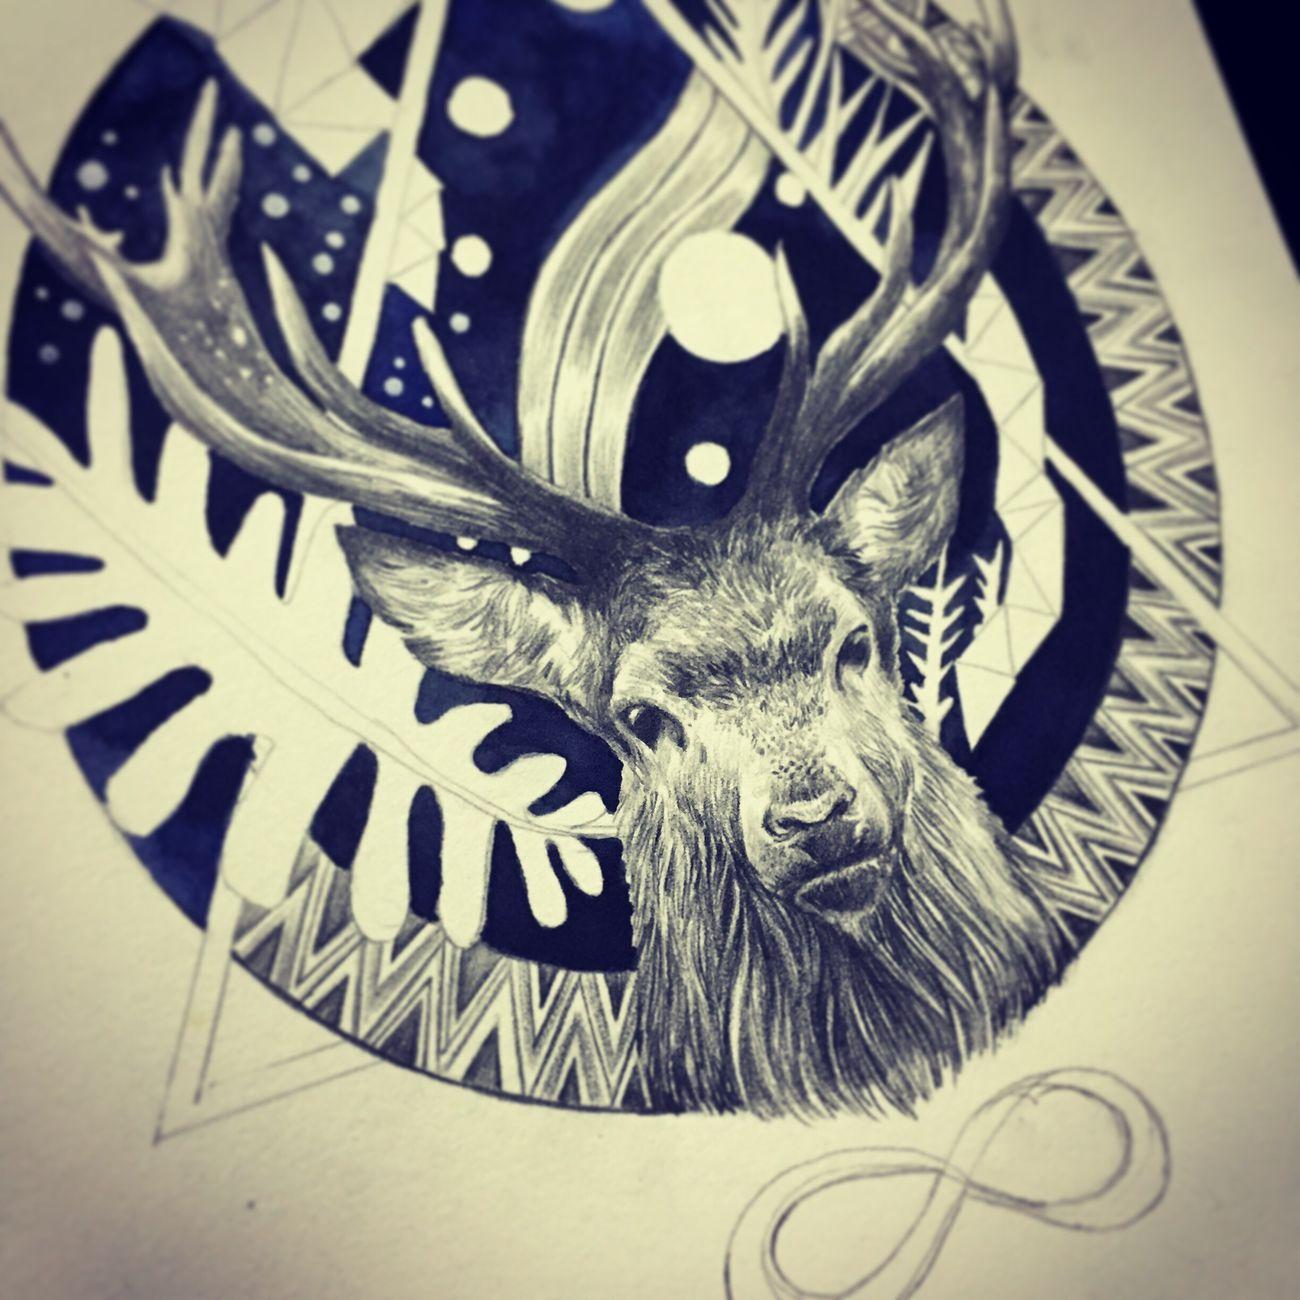 Wip Workinprogress Drawing Pencil Drawing GraphitePencil Deer Drawing